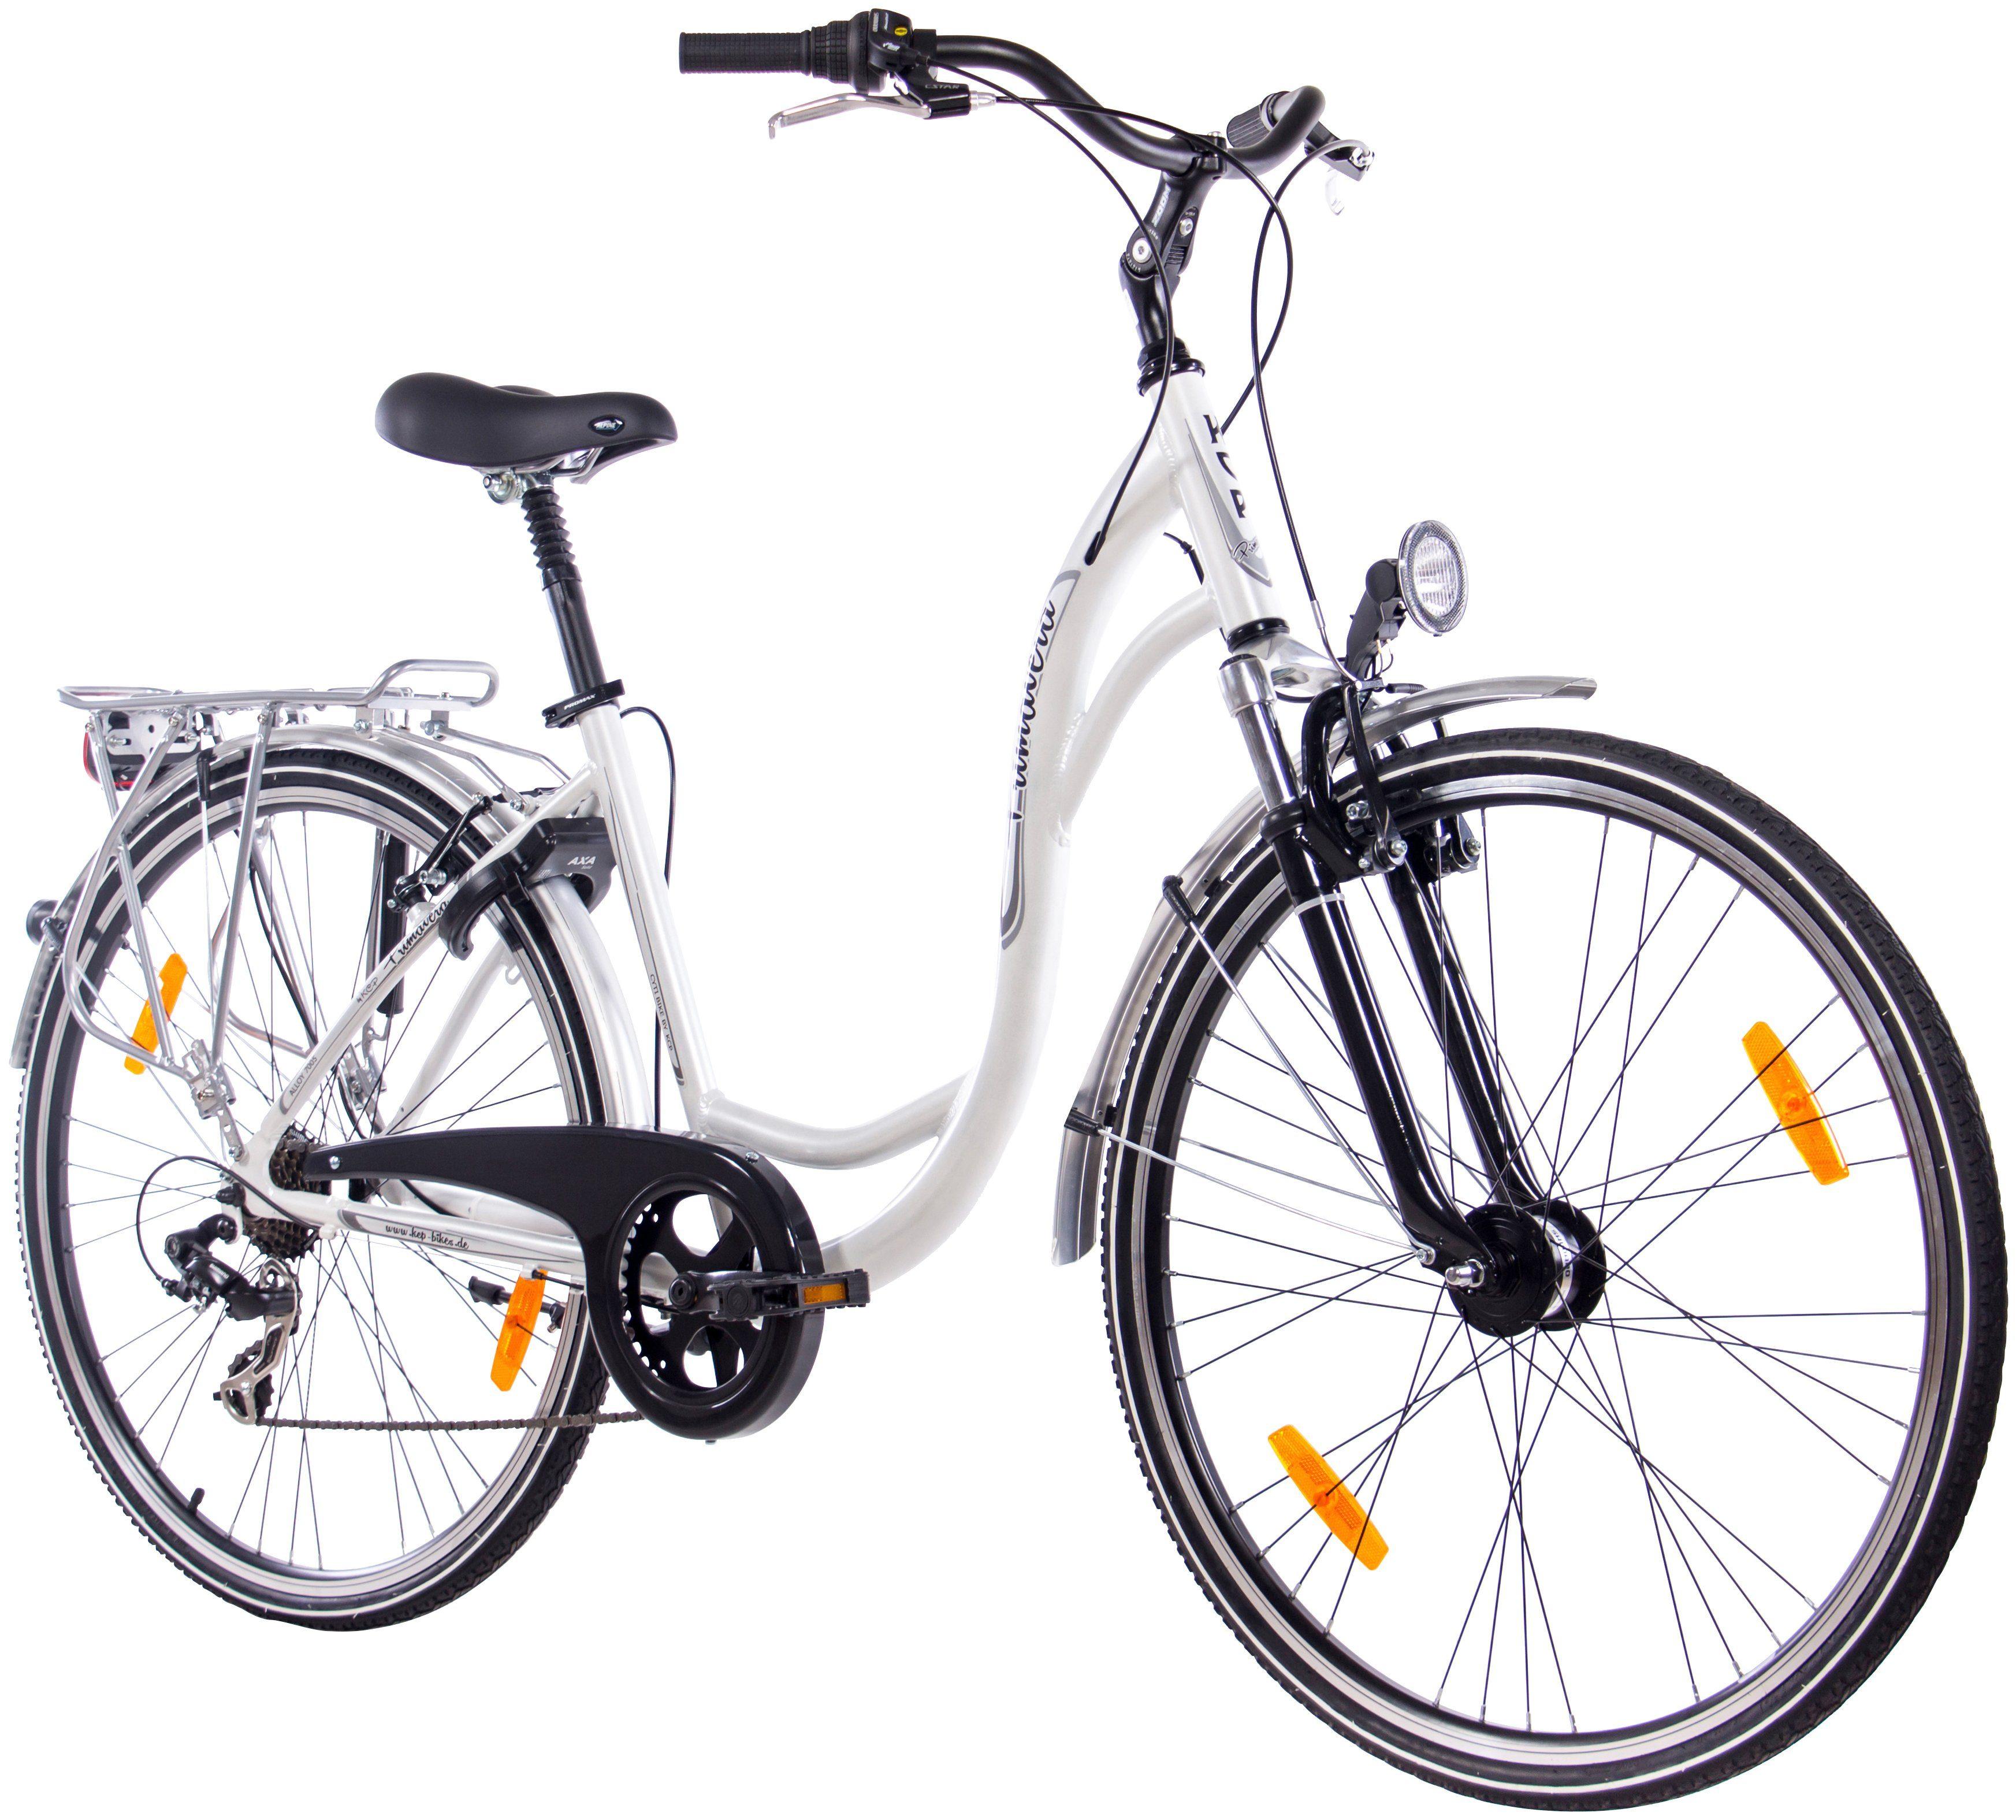 Citybike Damen »Primavera«, 28 Zoll, 7 Gang, V-Bremsen